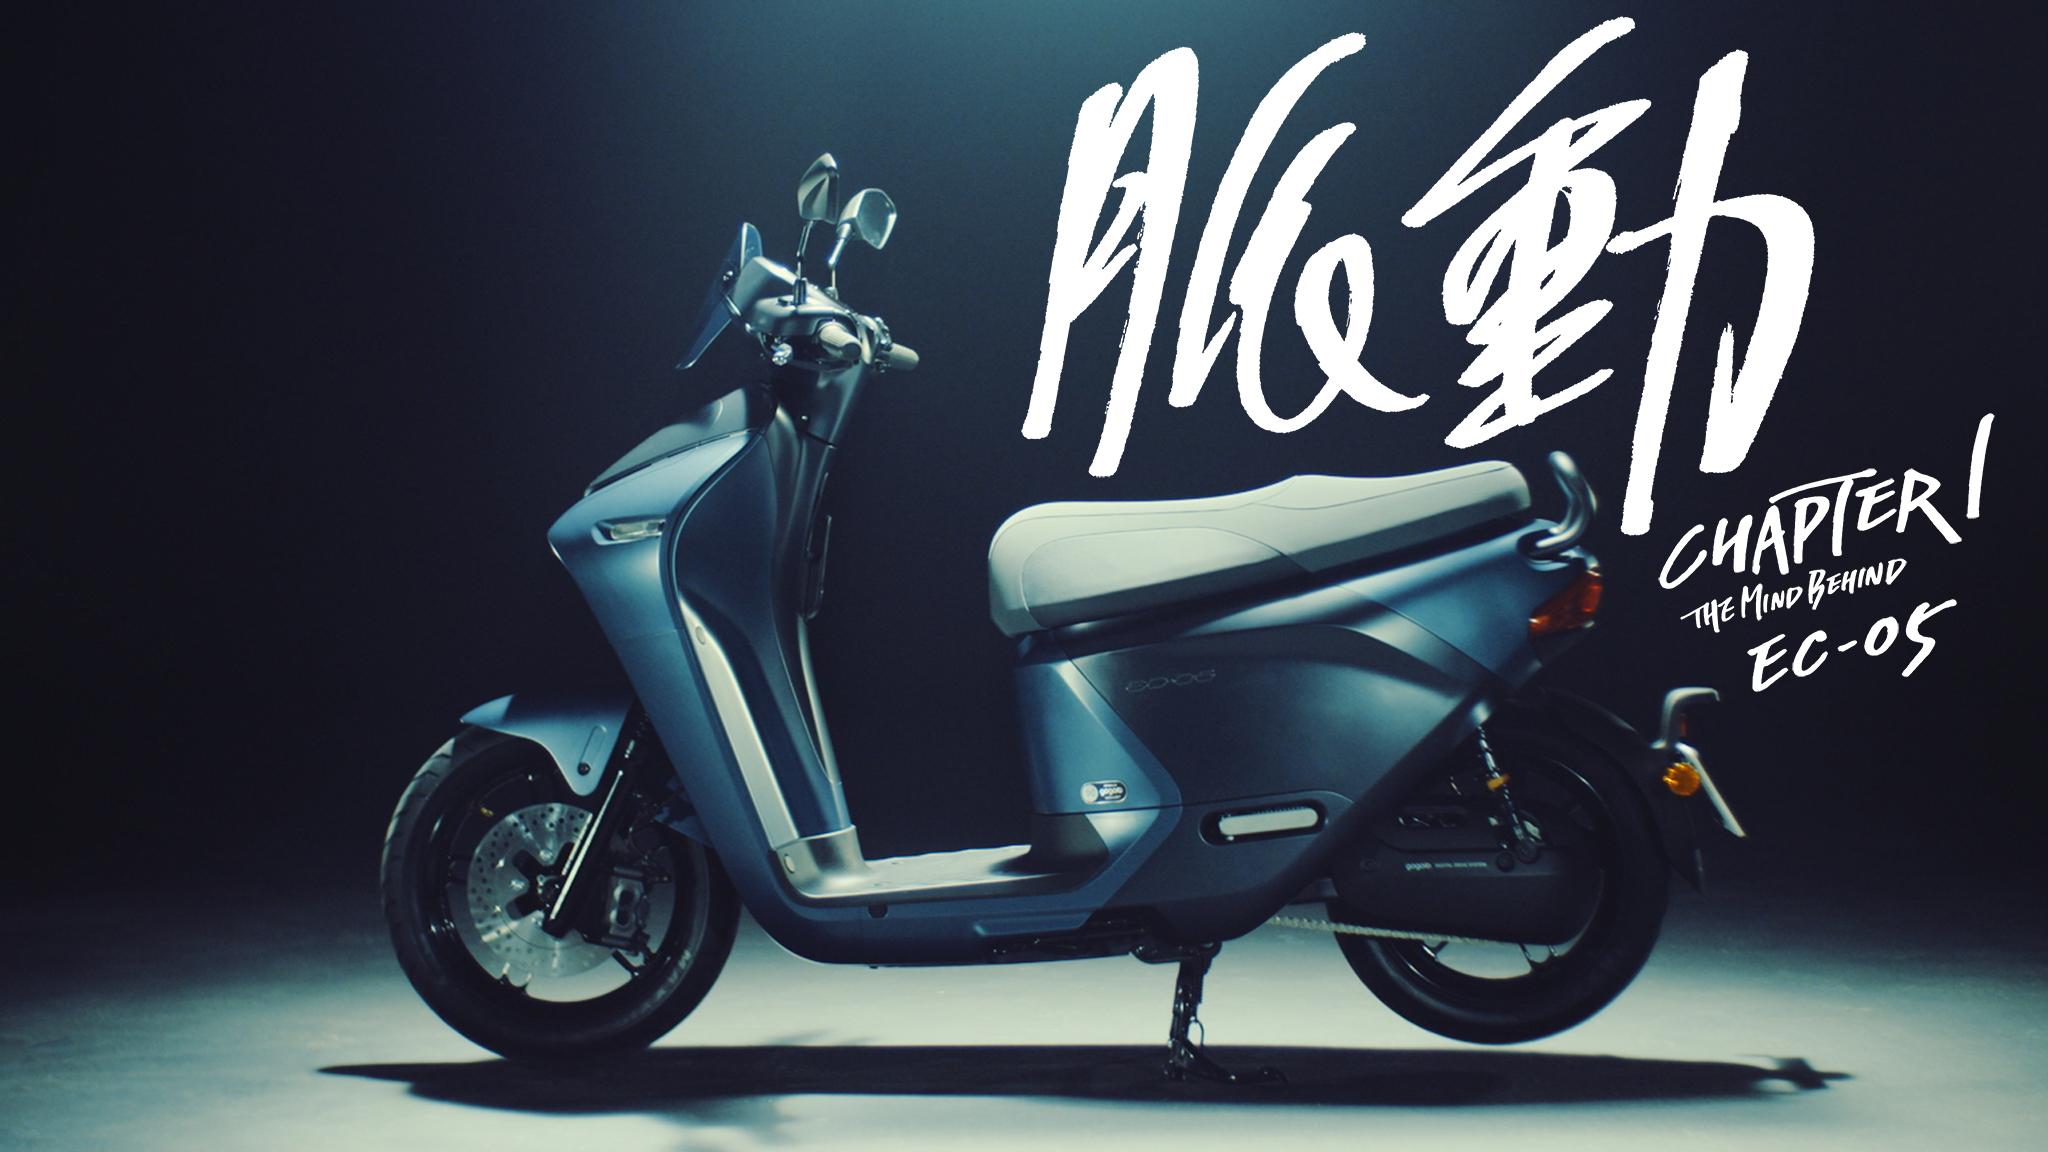 YAMAHA EC-05_04_請務必載明出處Provided by Yamaha Motor Co., Ltd.jpg